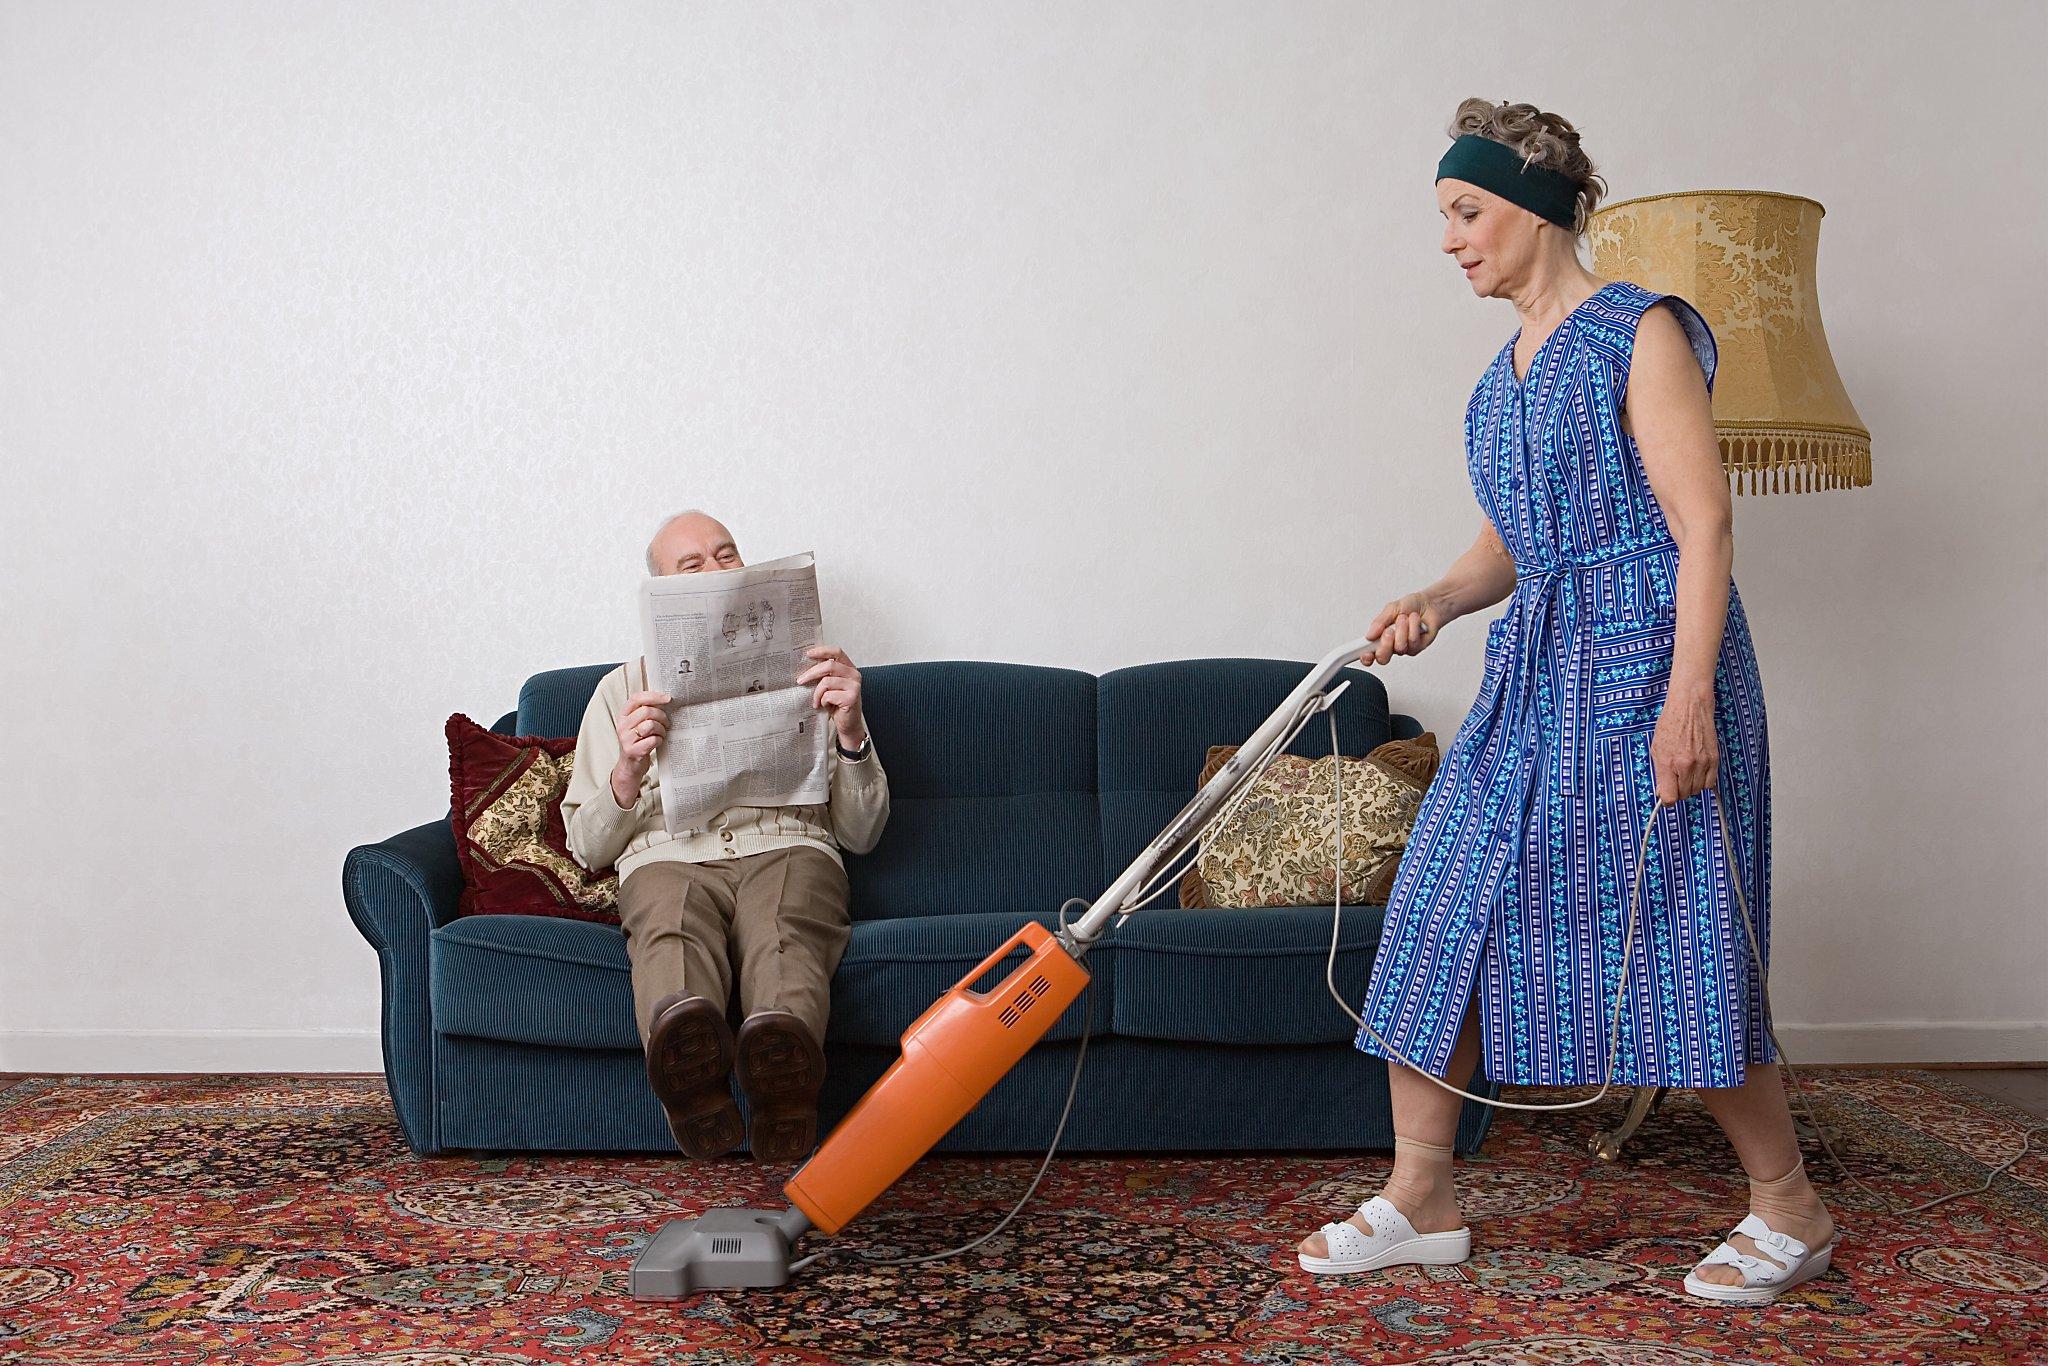 Dear Abby: Hire housekeeper if husband won't help